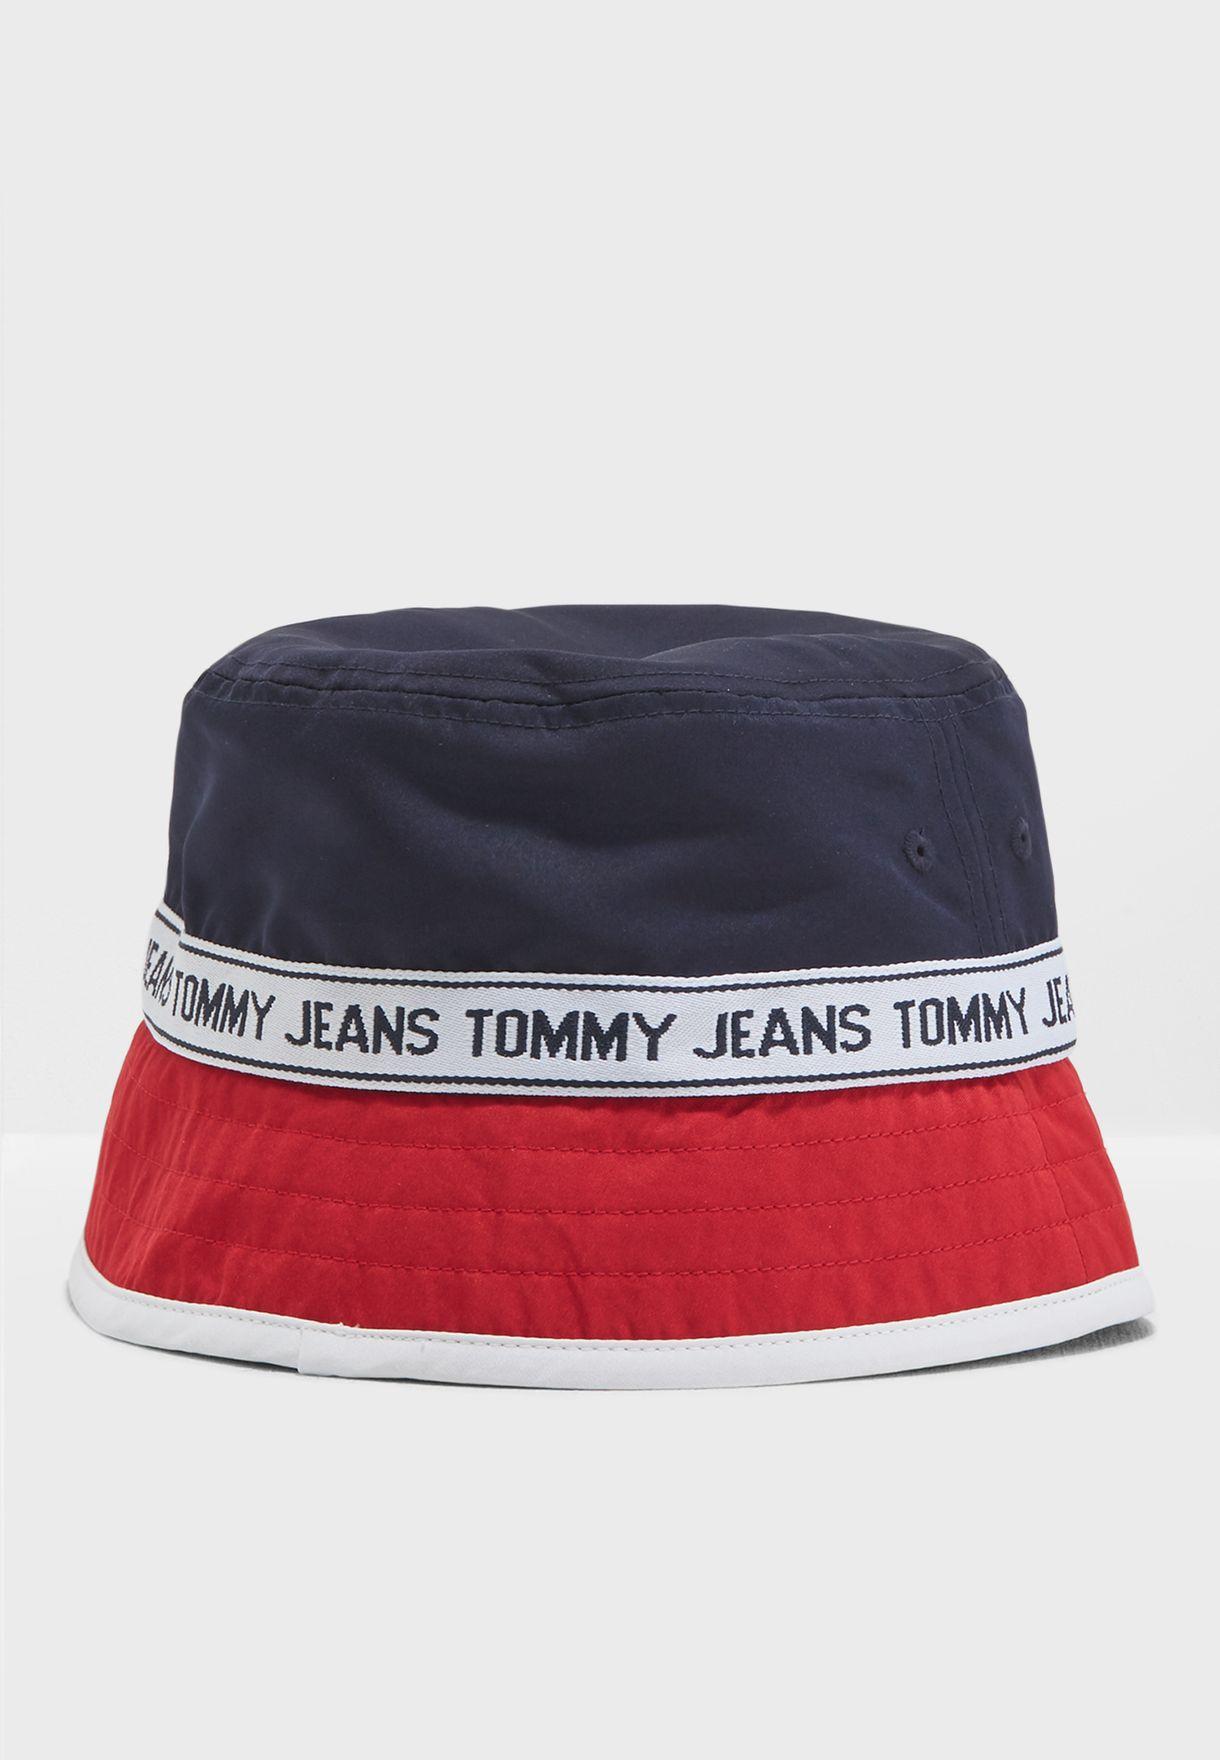 550fad104fc0a Shop Tommy Jeans multicolor Logo Bucket Hat AU0AU00146 for Men in ...